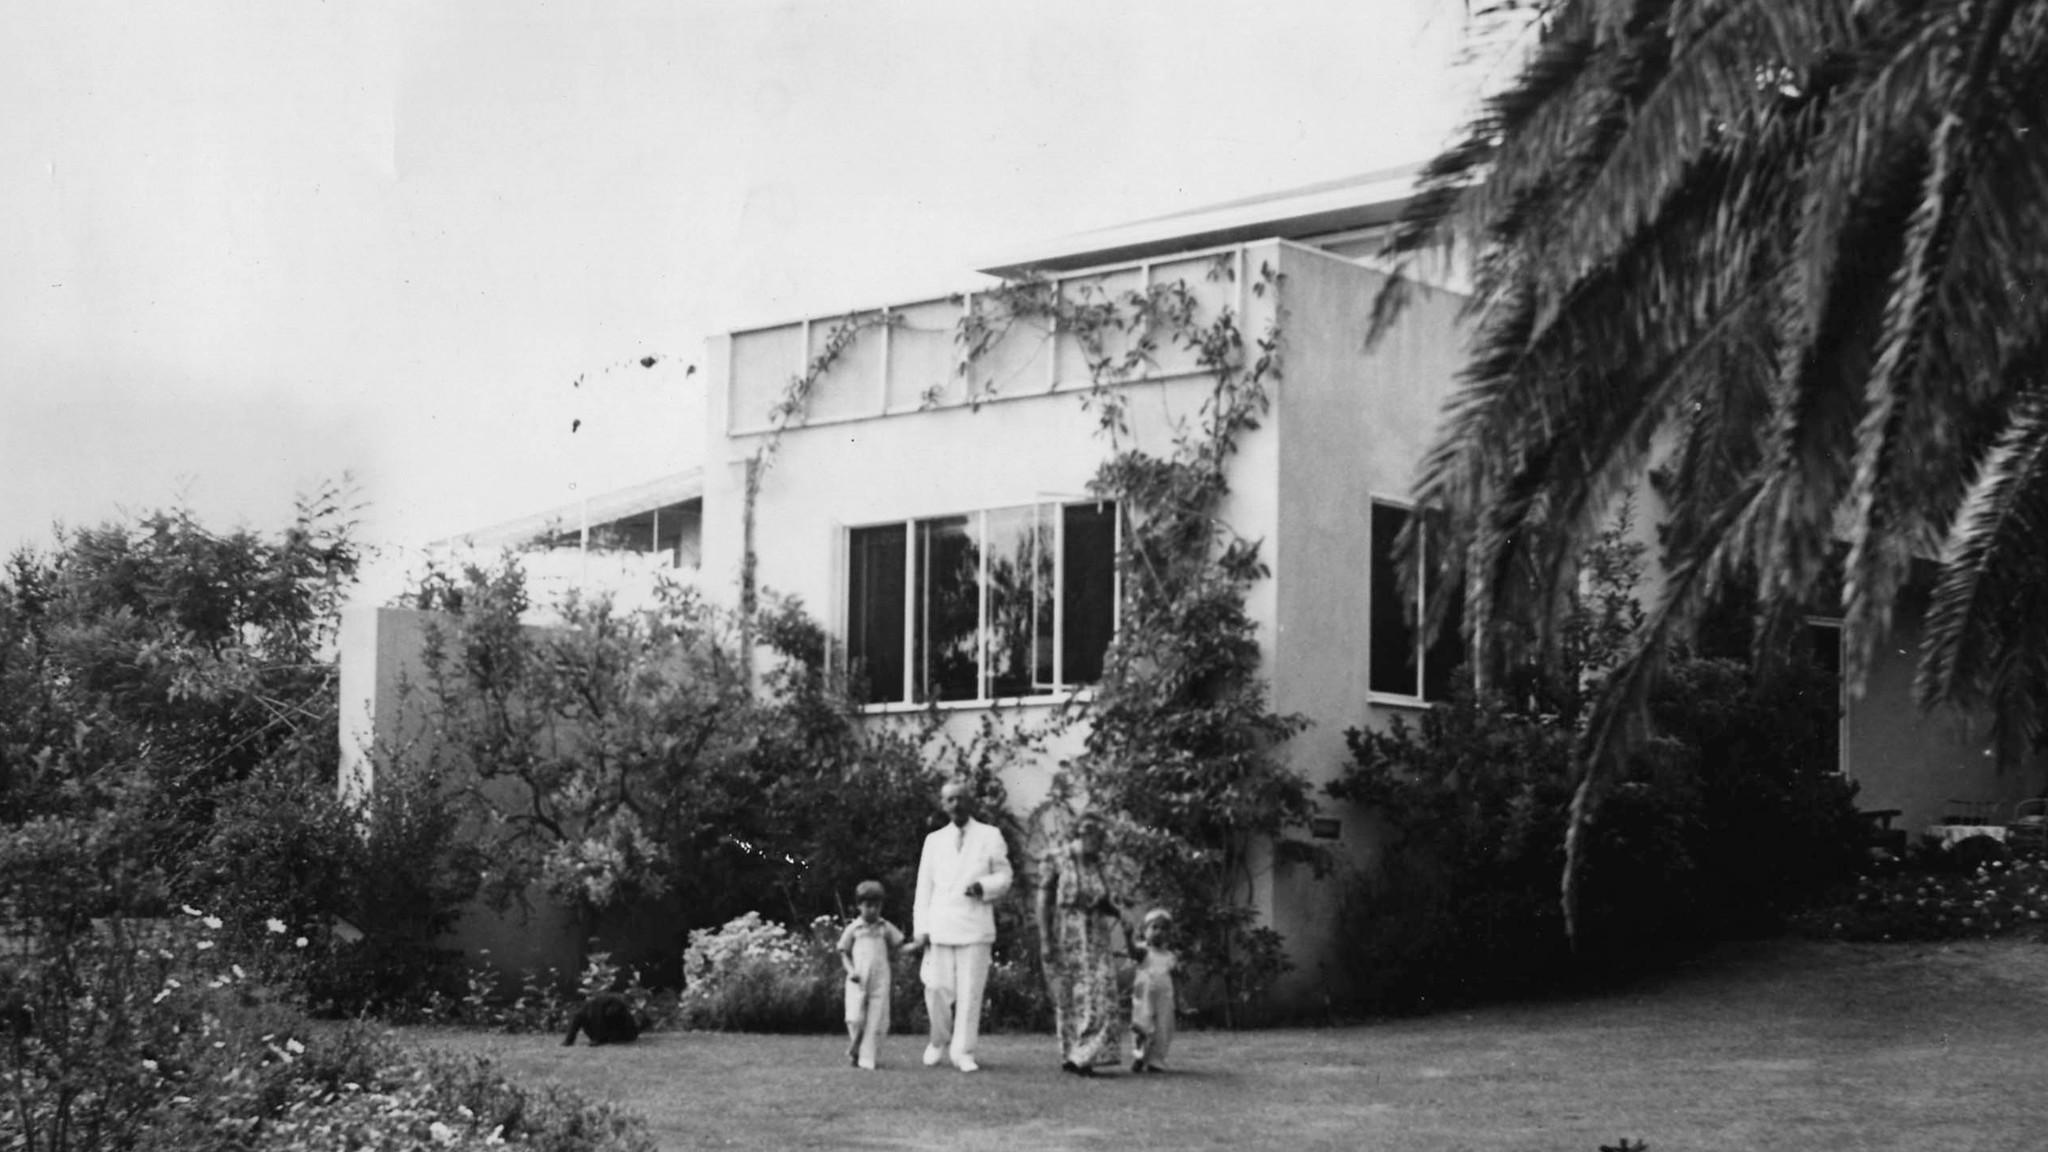 thomas mann house by midcentury great j r davidson l a 39 s next big teardown la times. Black Bedroom Furniture Sets. Home Design Ideas